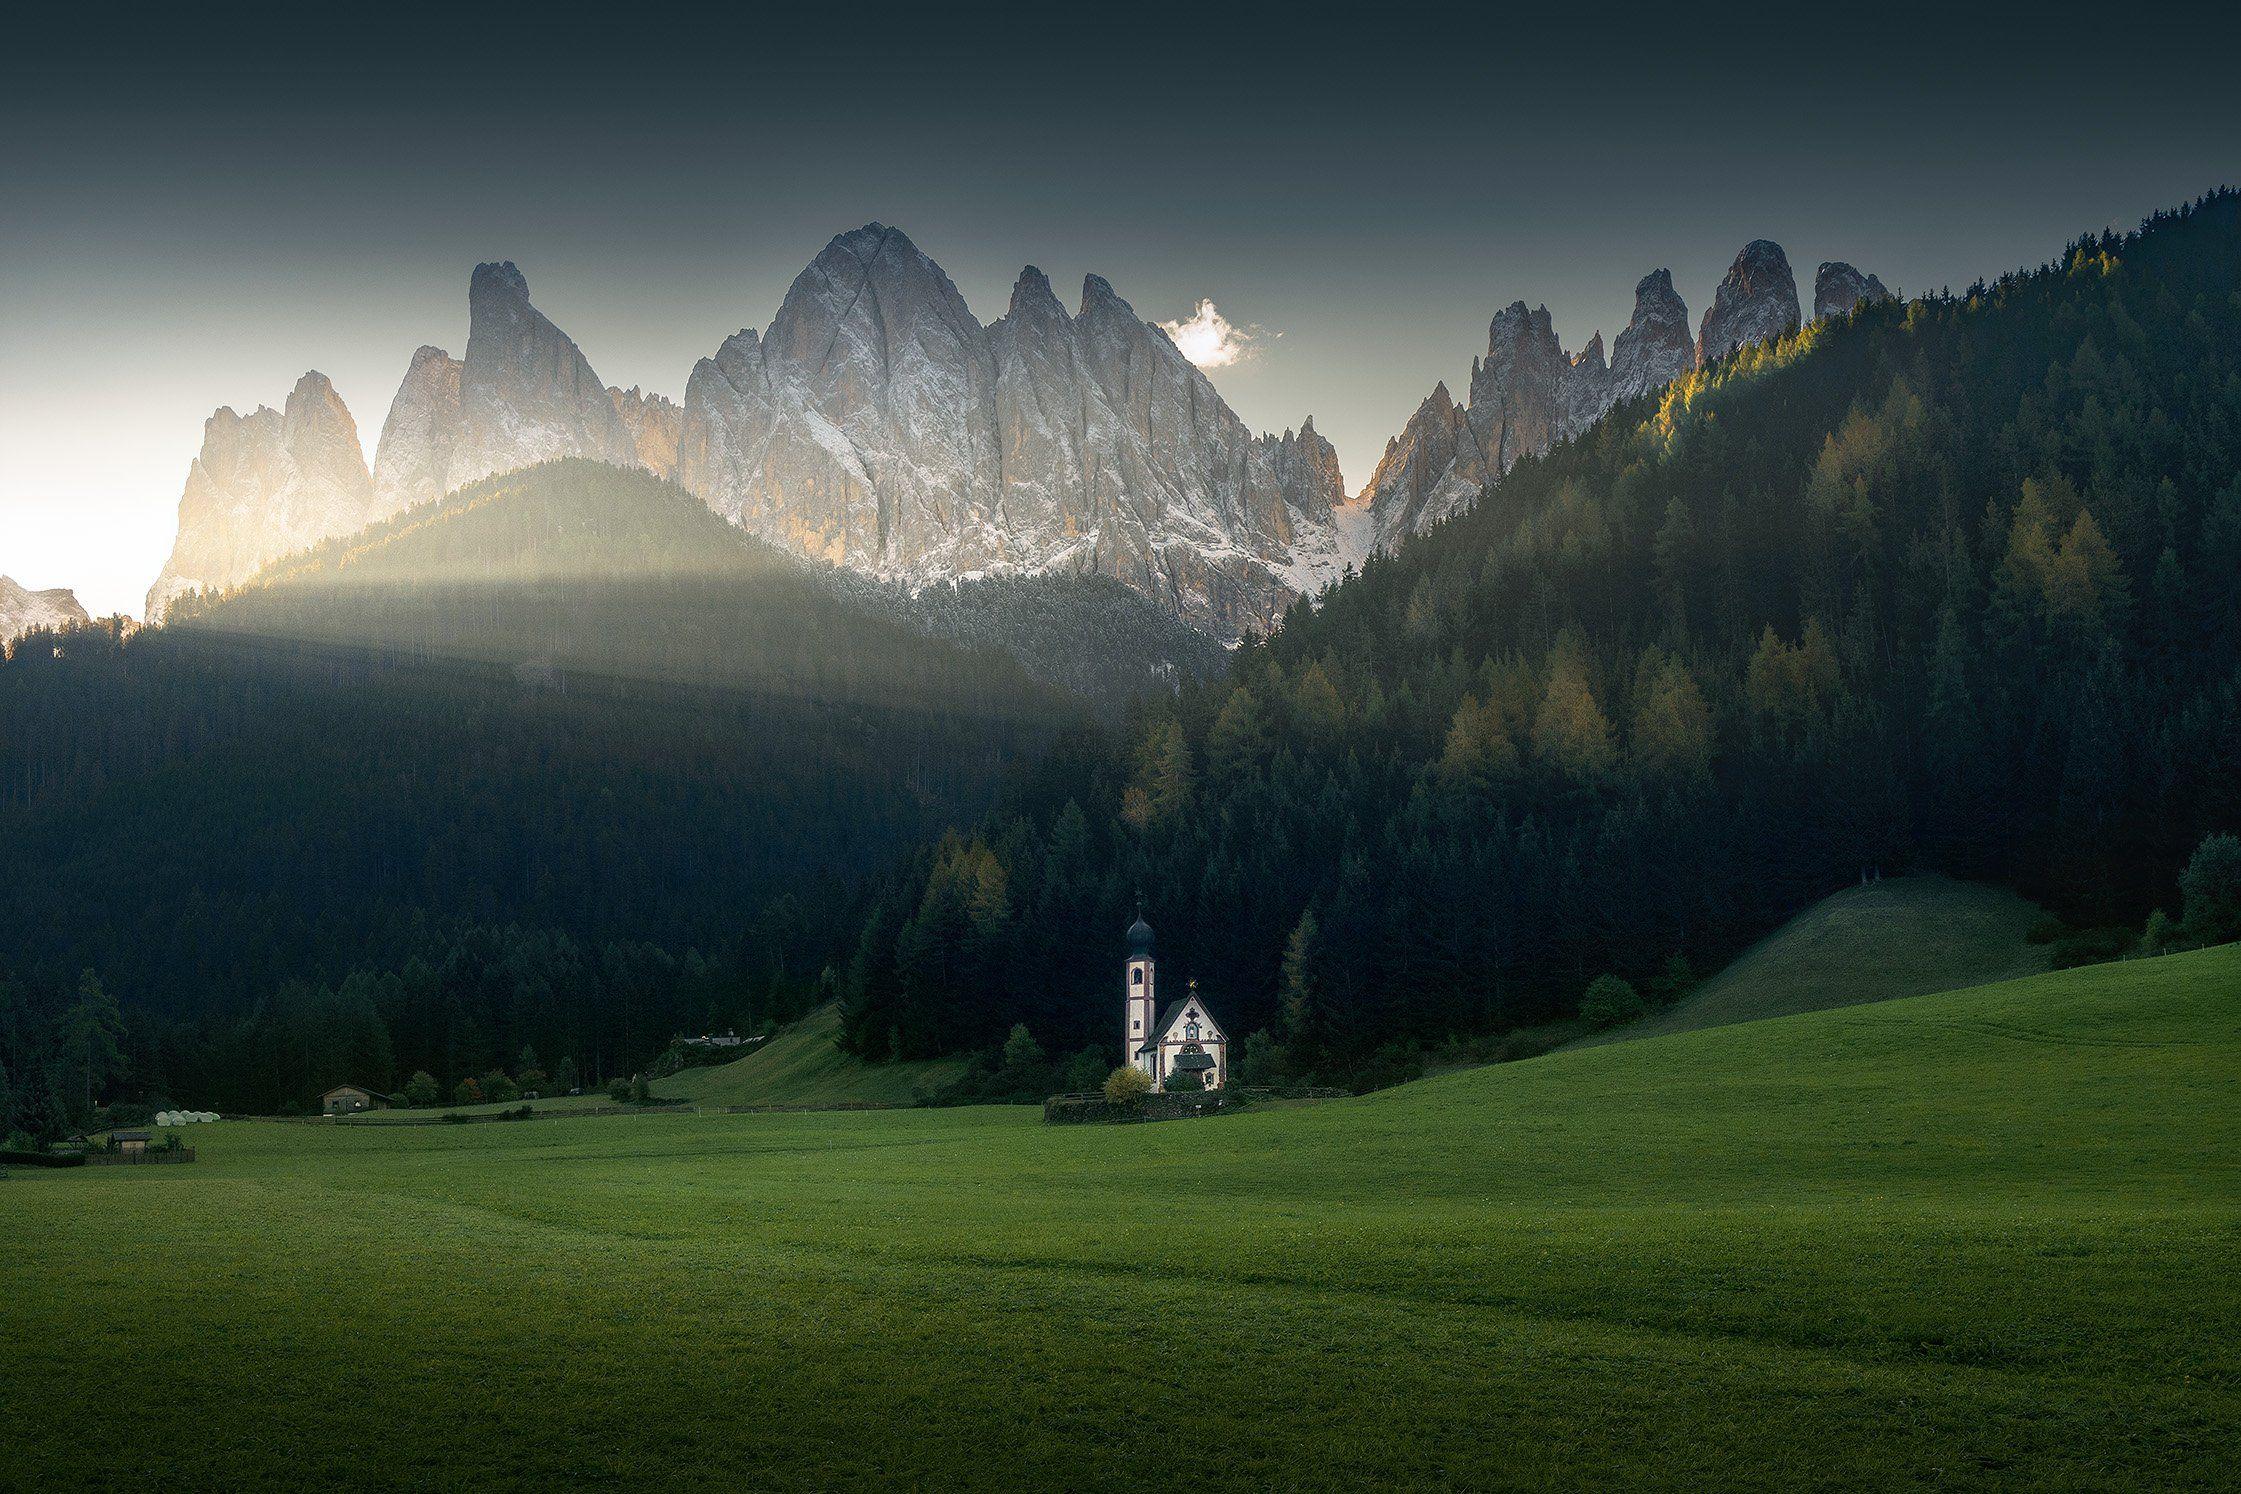 dolomites, light, mountains, travel, adventure, Arsenis Billy